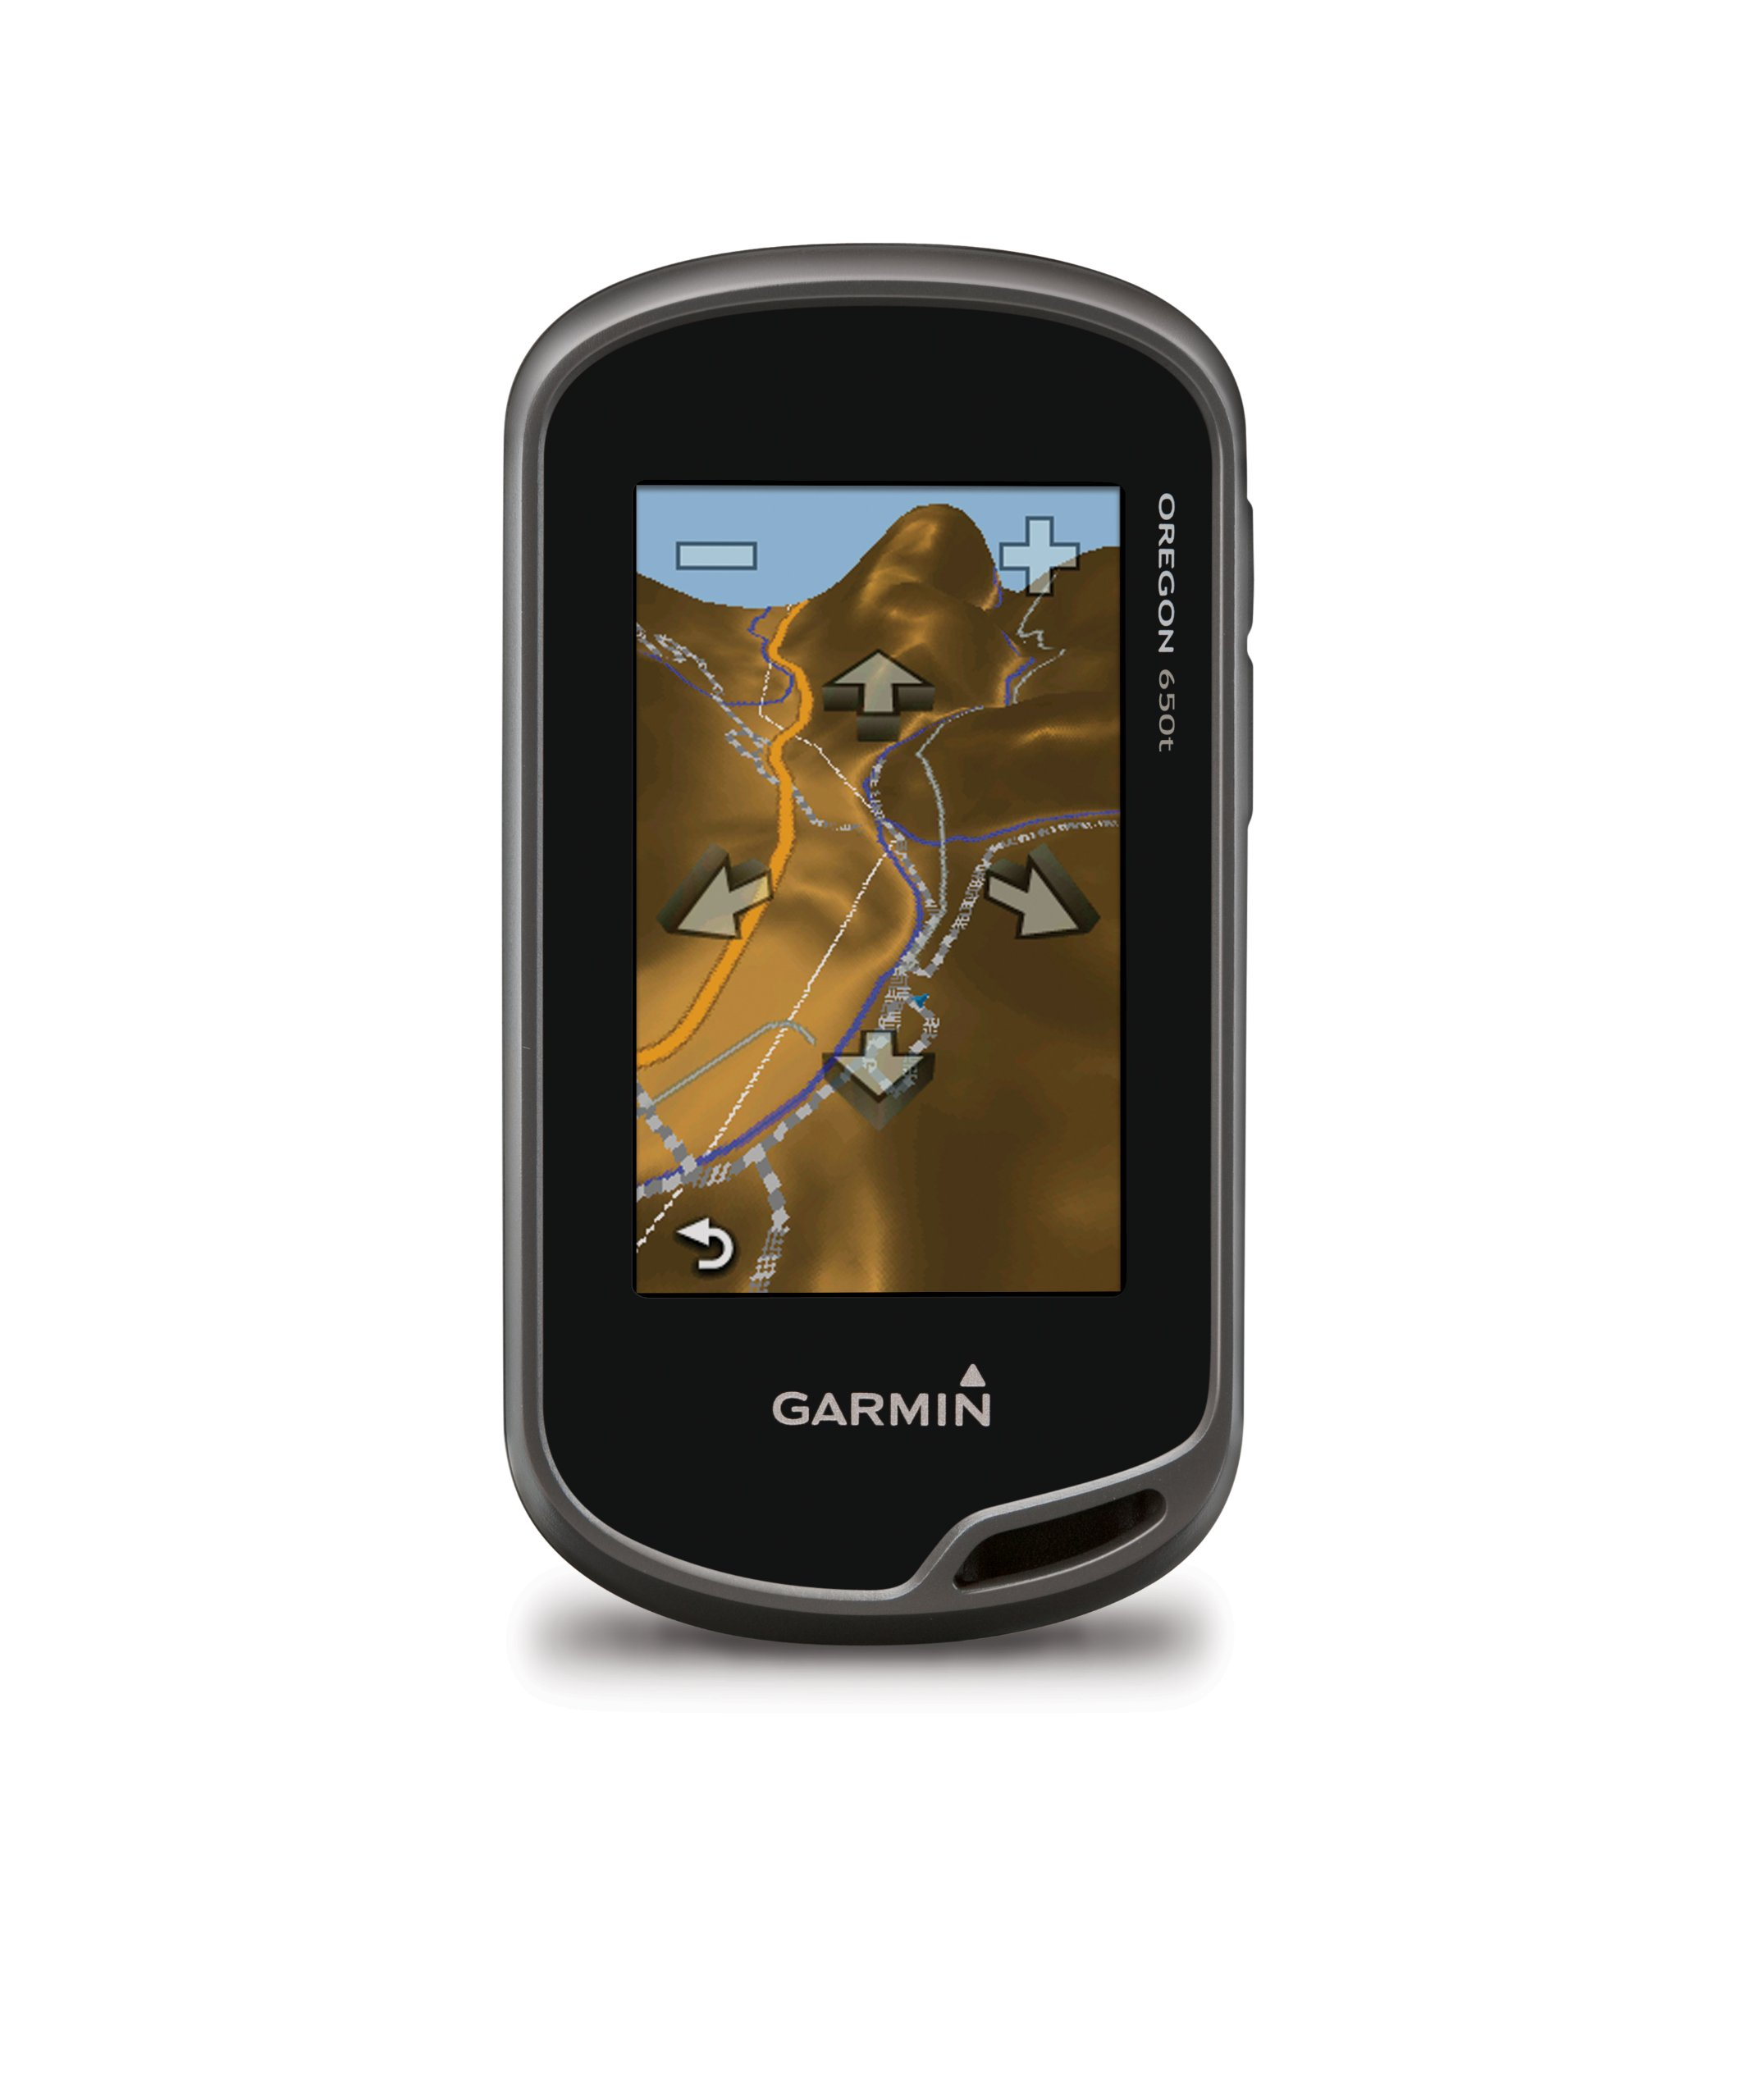 Garmin Oregon 650t 3-Inch Handheld GPS with 8MP Digital Camera (US Topographic Maps) by Garmin